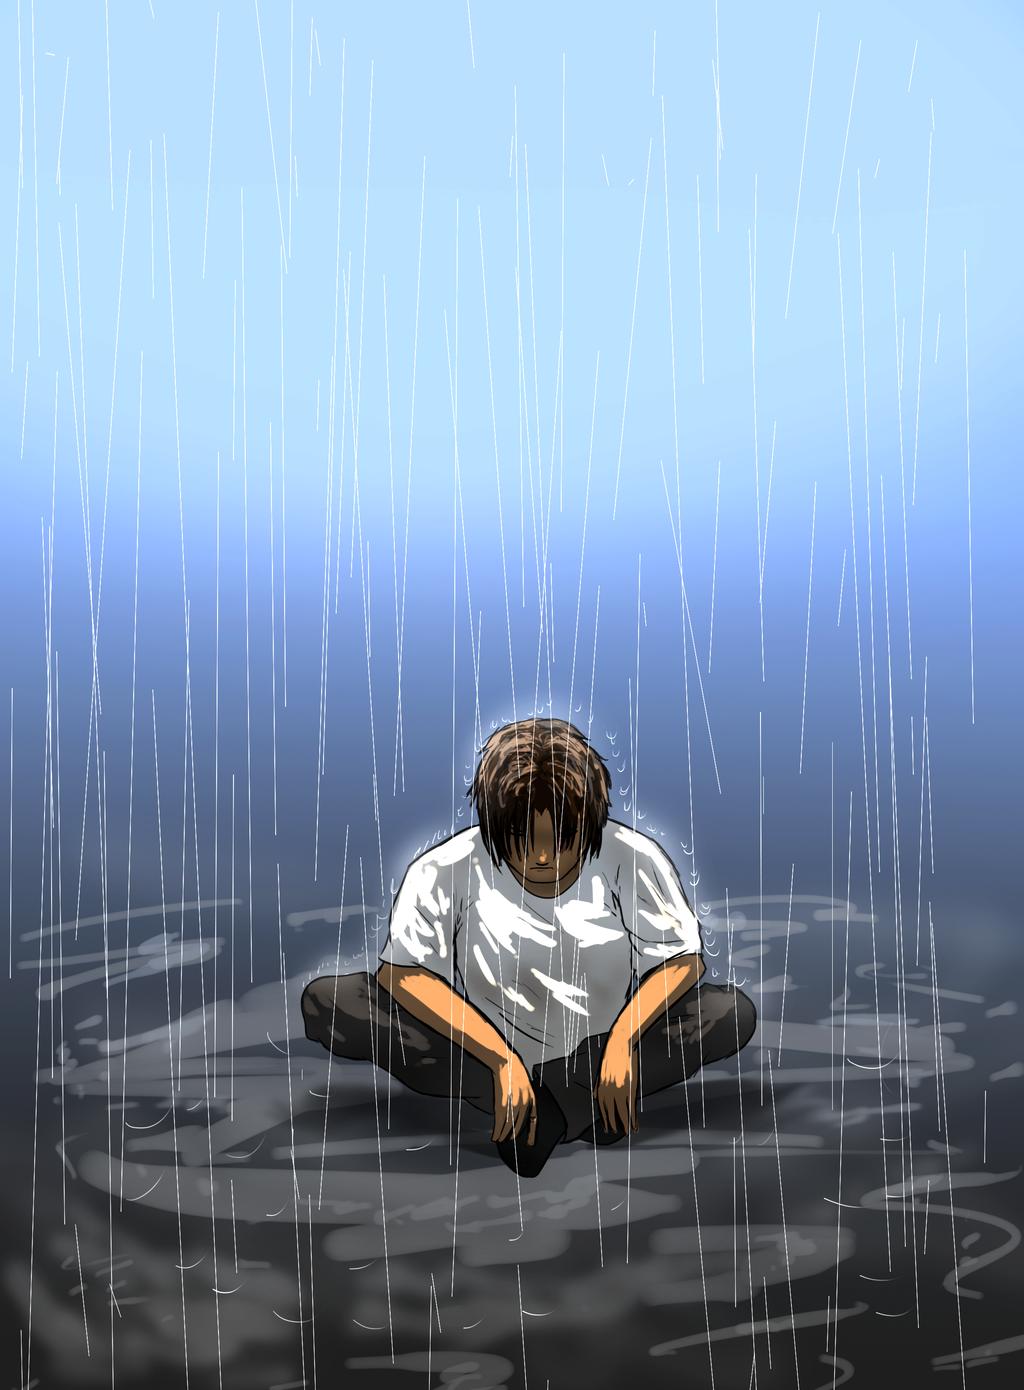 Rainy Hizruk by Dreamfollower